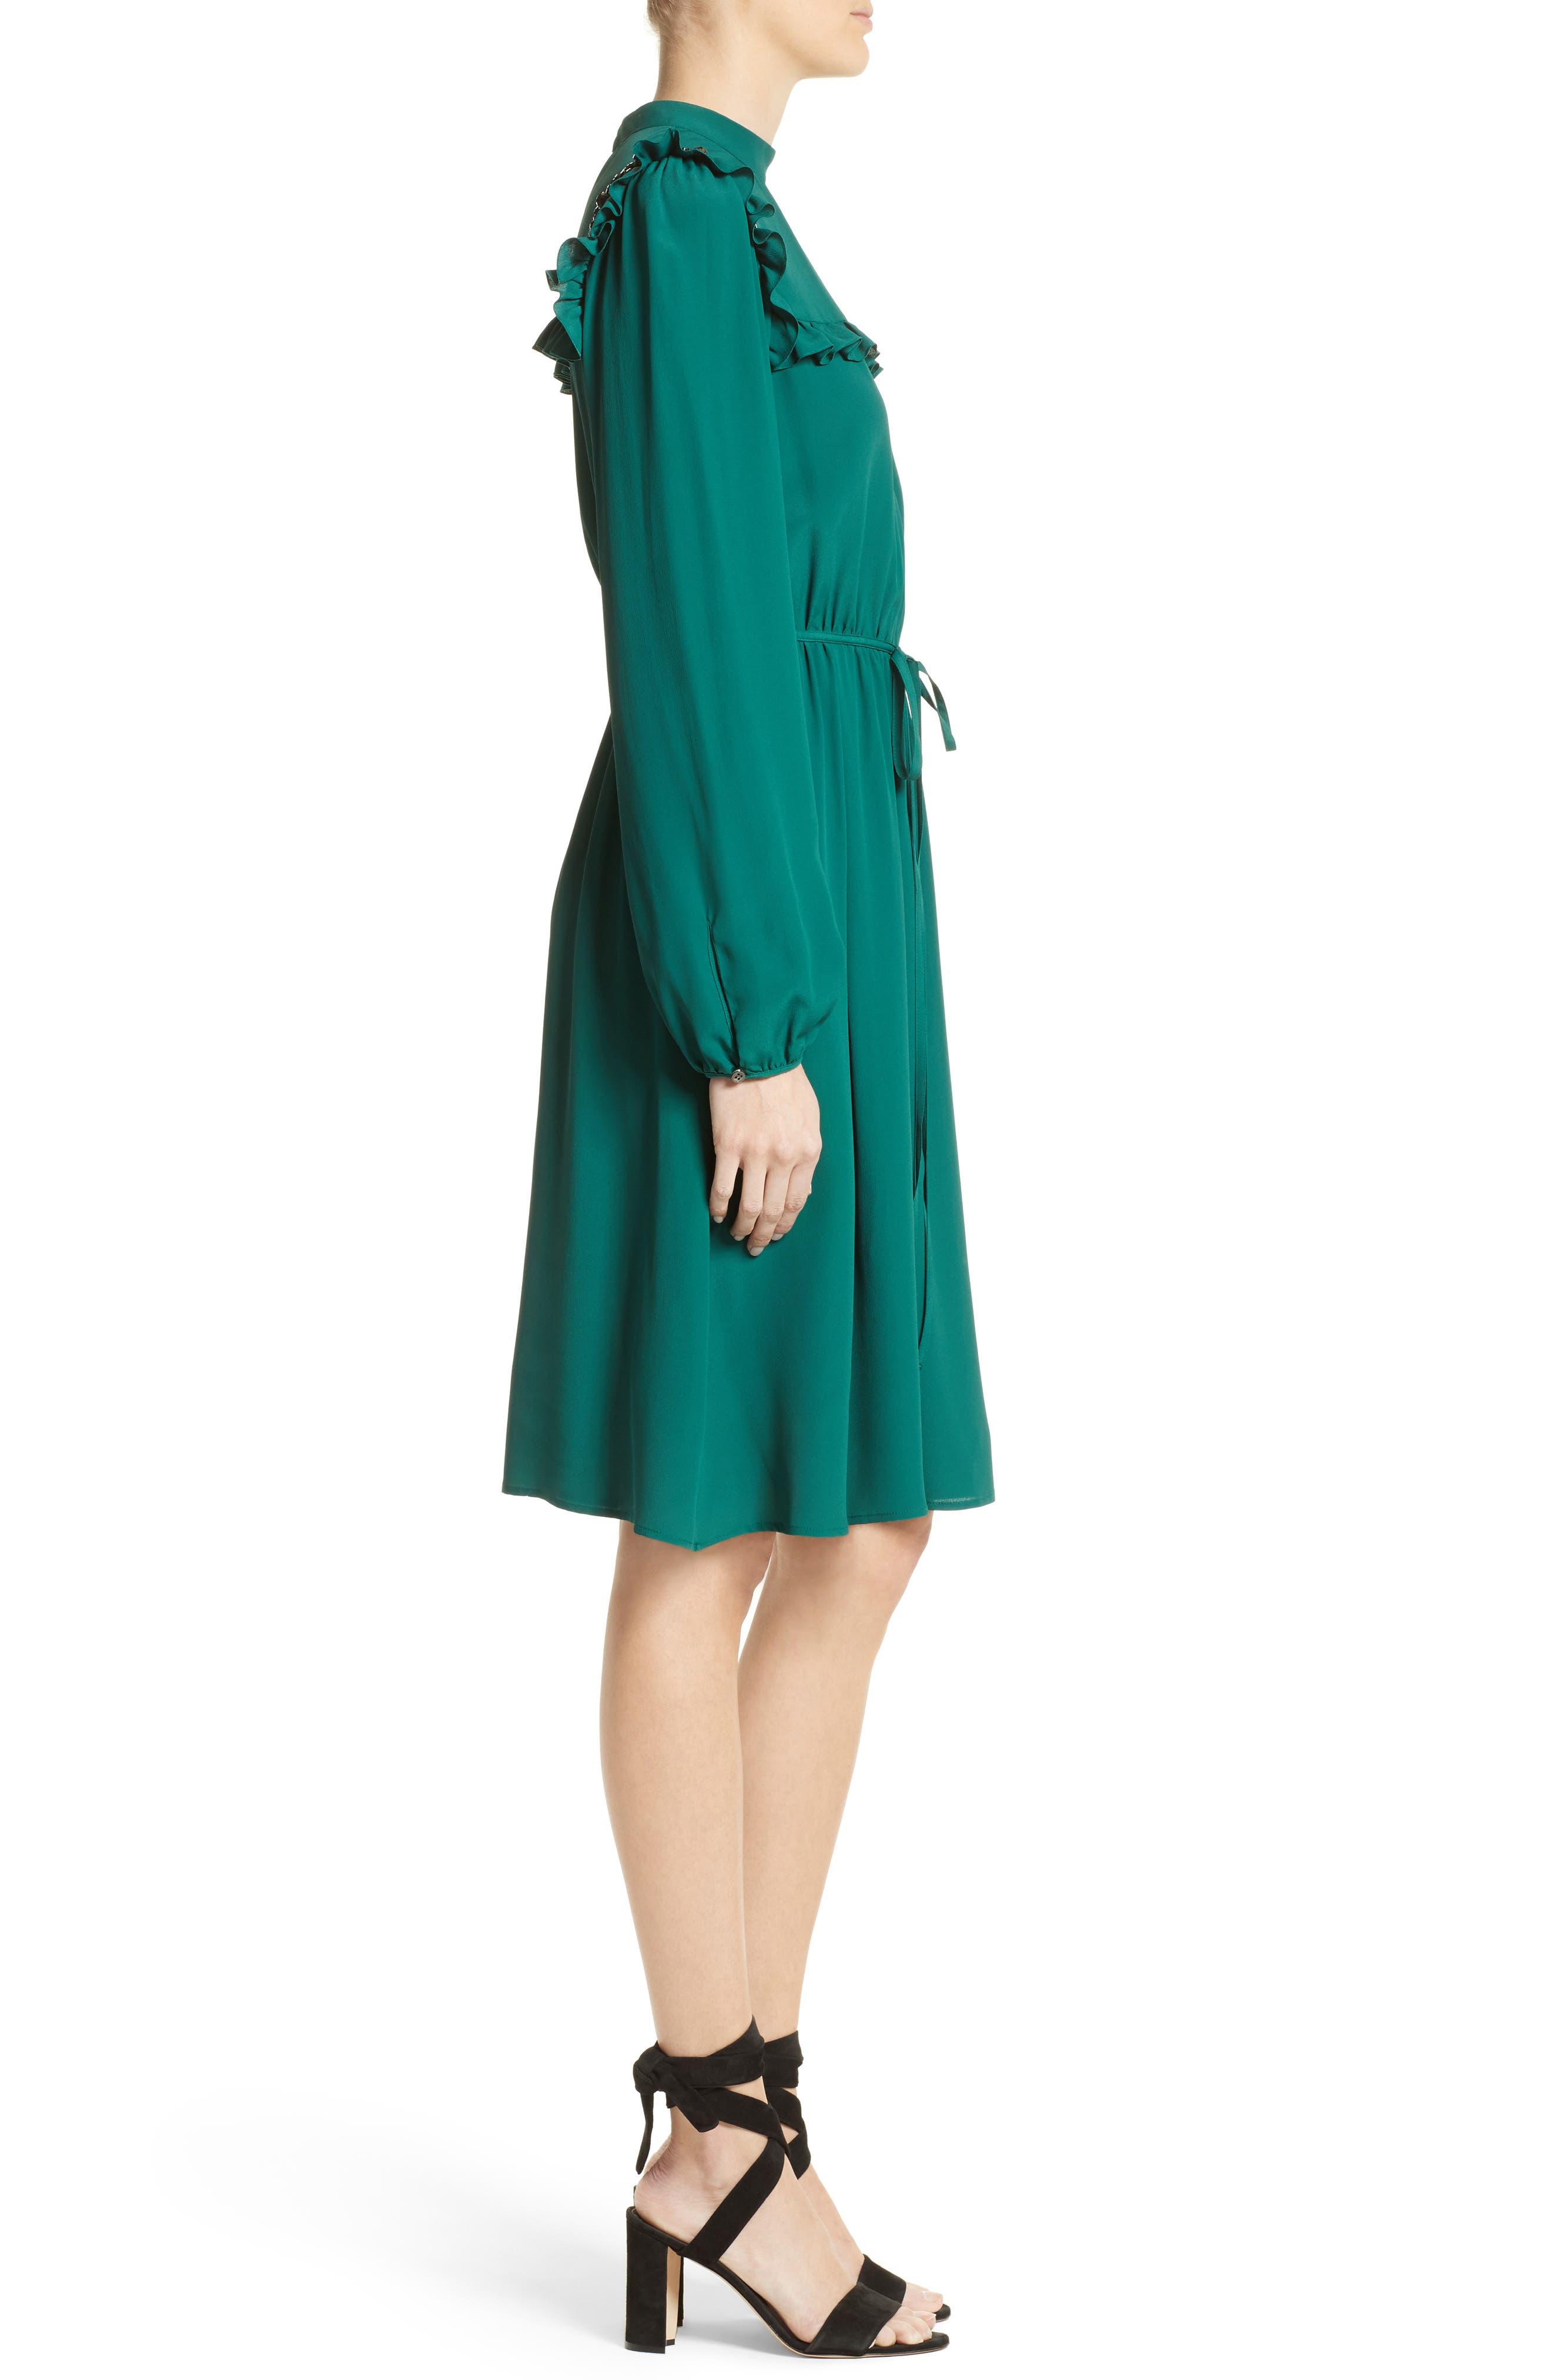 Crystal Embellished Ruffle Dress,                             Alternate thumbnail 3, color,                             300